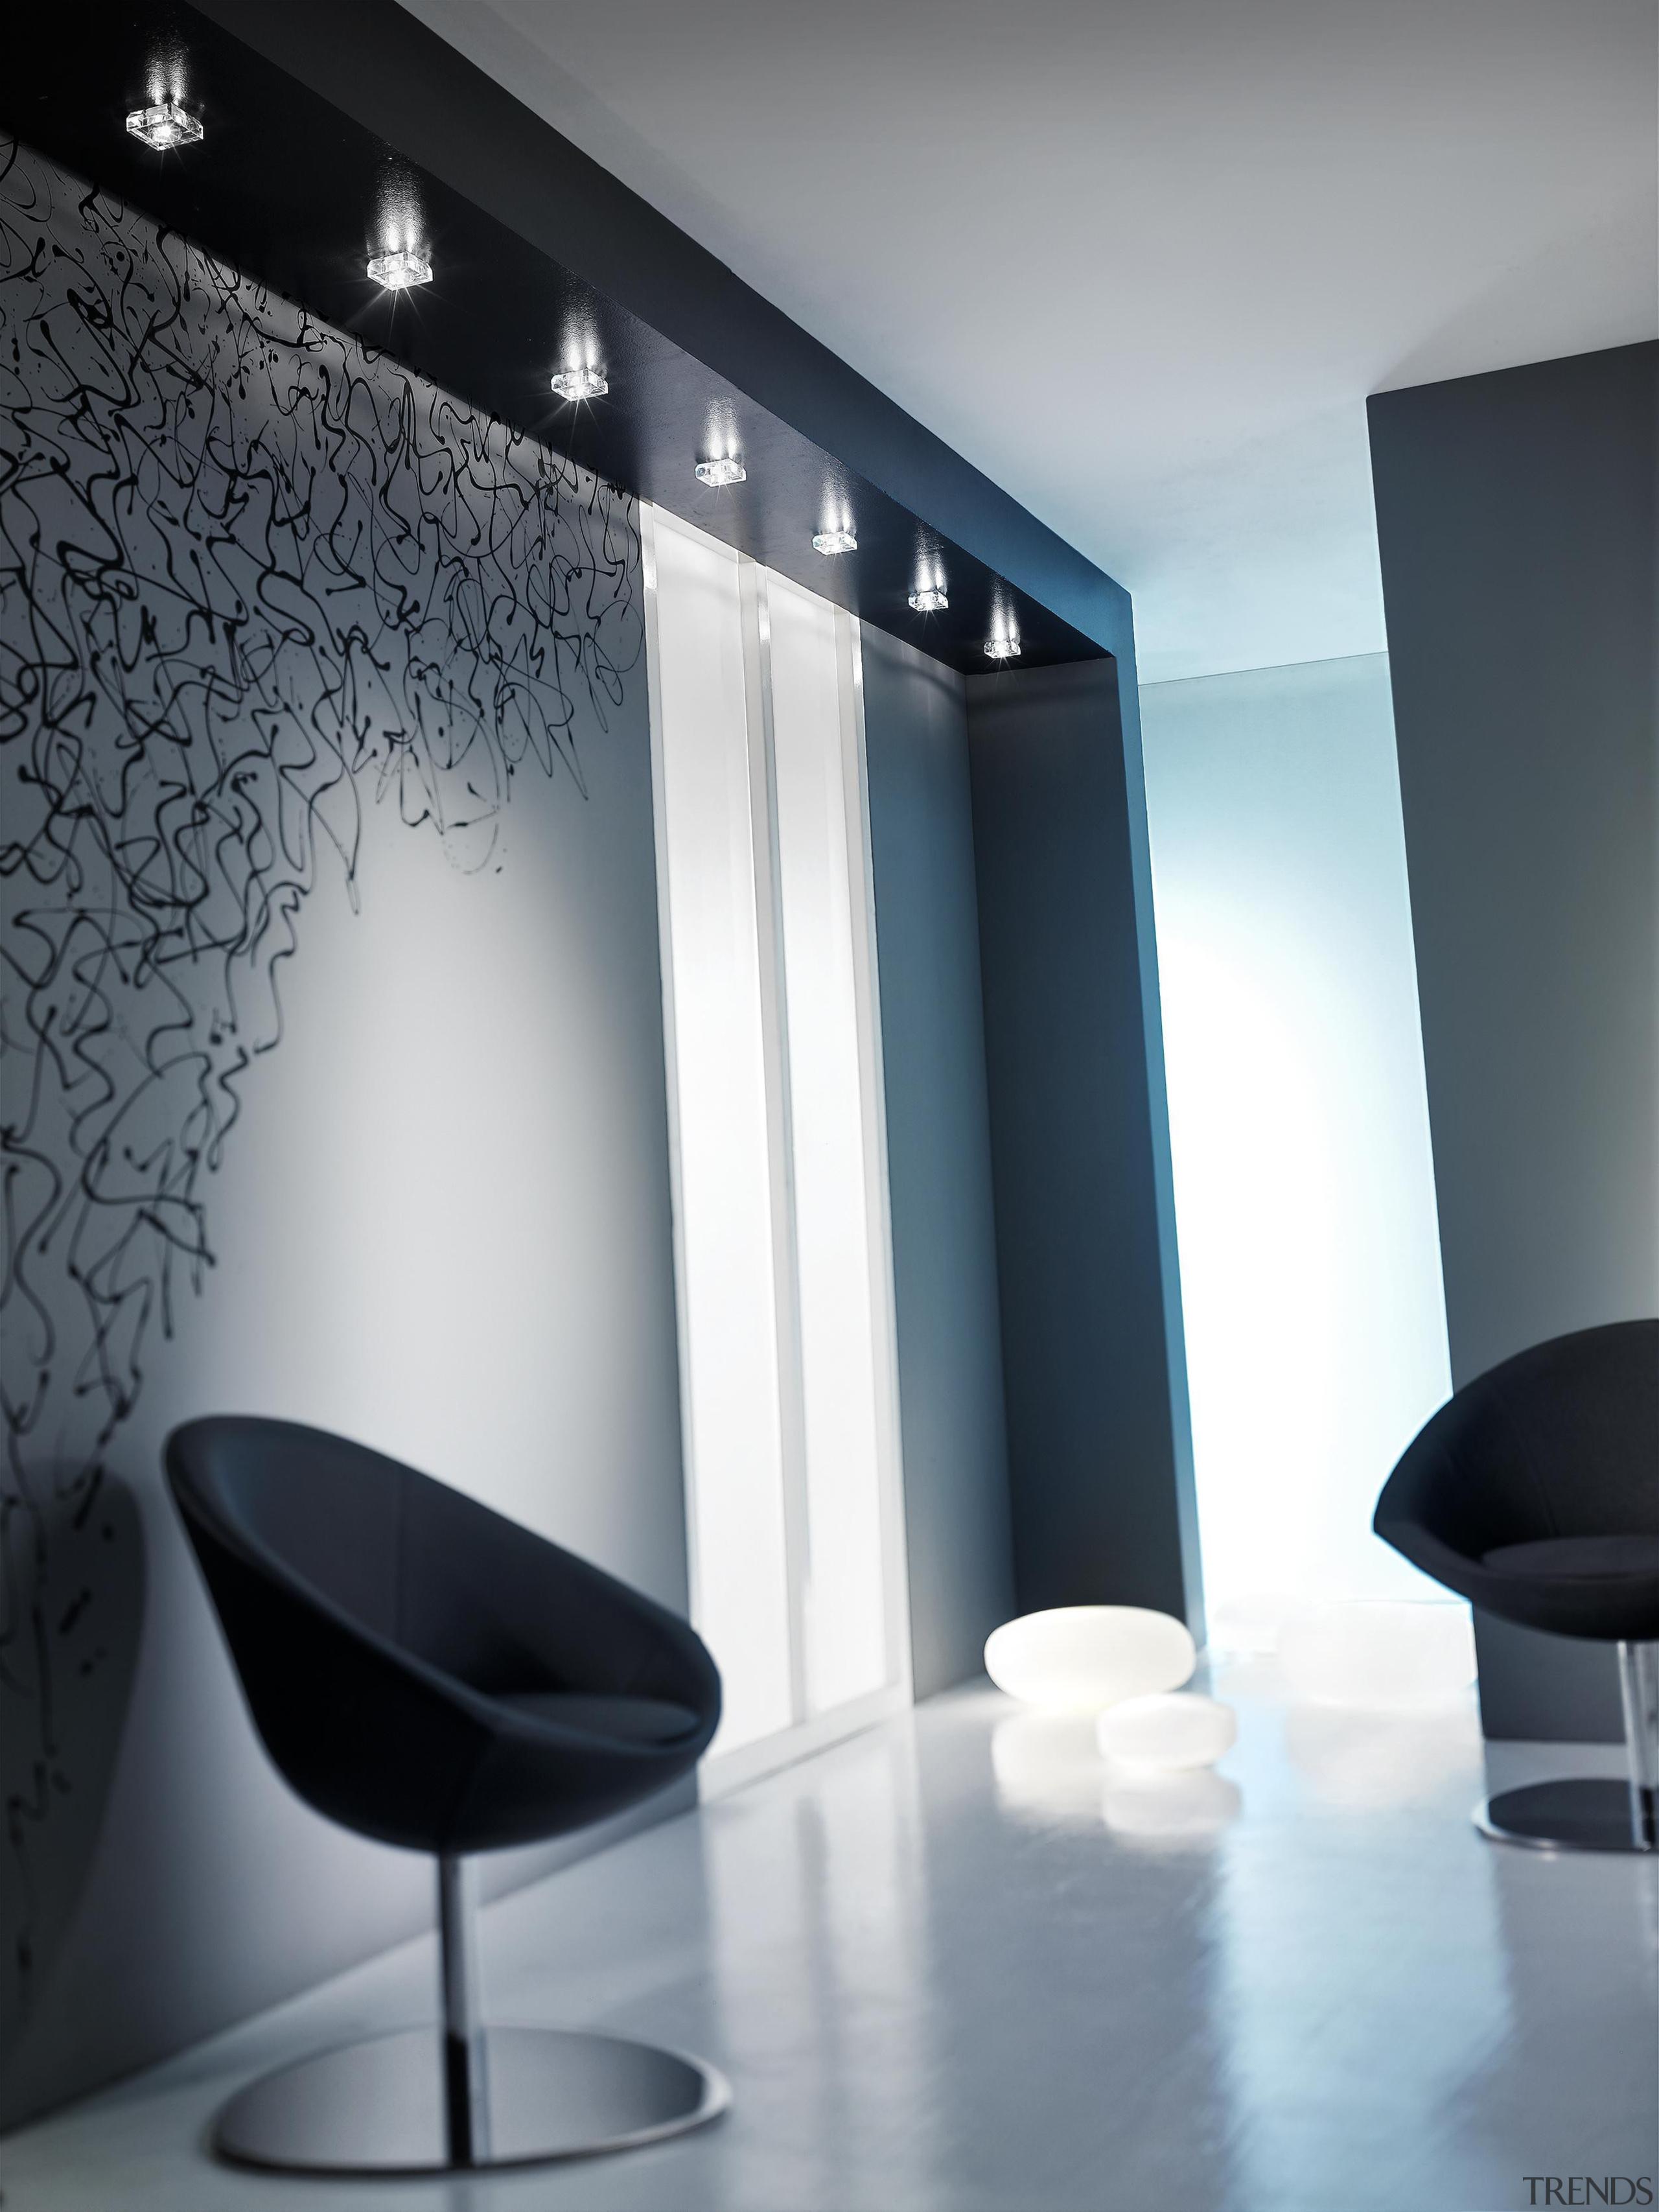 LED Lights - ceiling | floor | furniture ceiling, floor, furniture, glass, interior design, light fixture, lighting, product design, table, tap, wall, gray, black